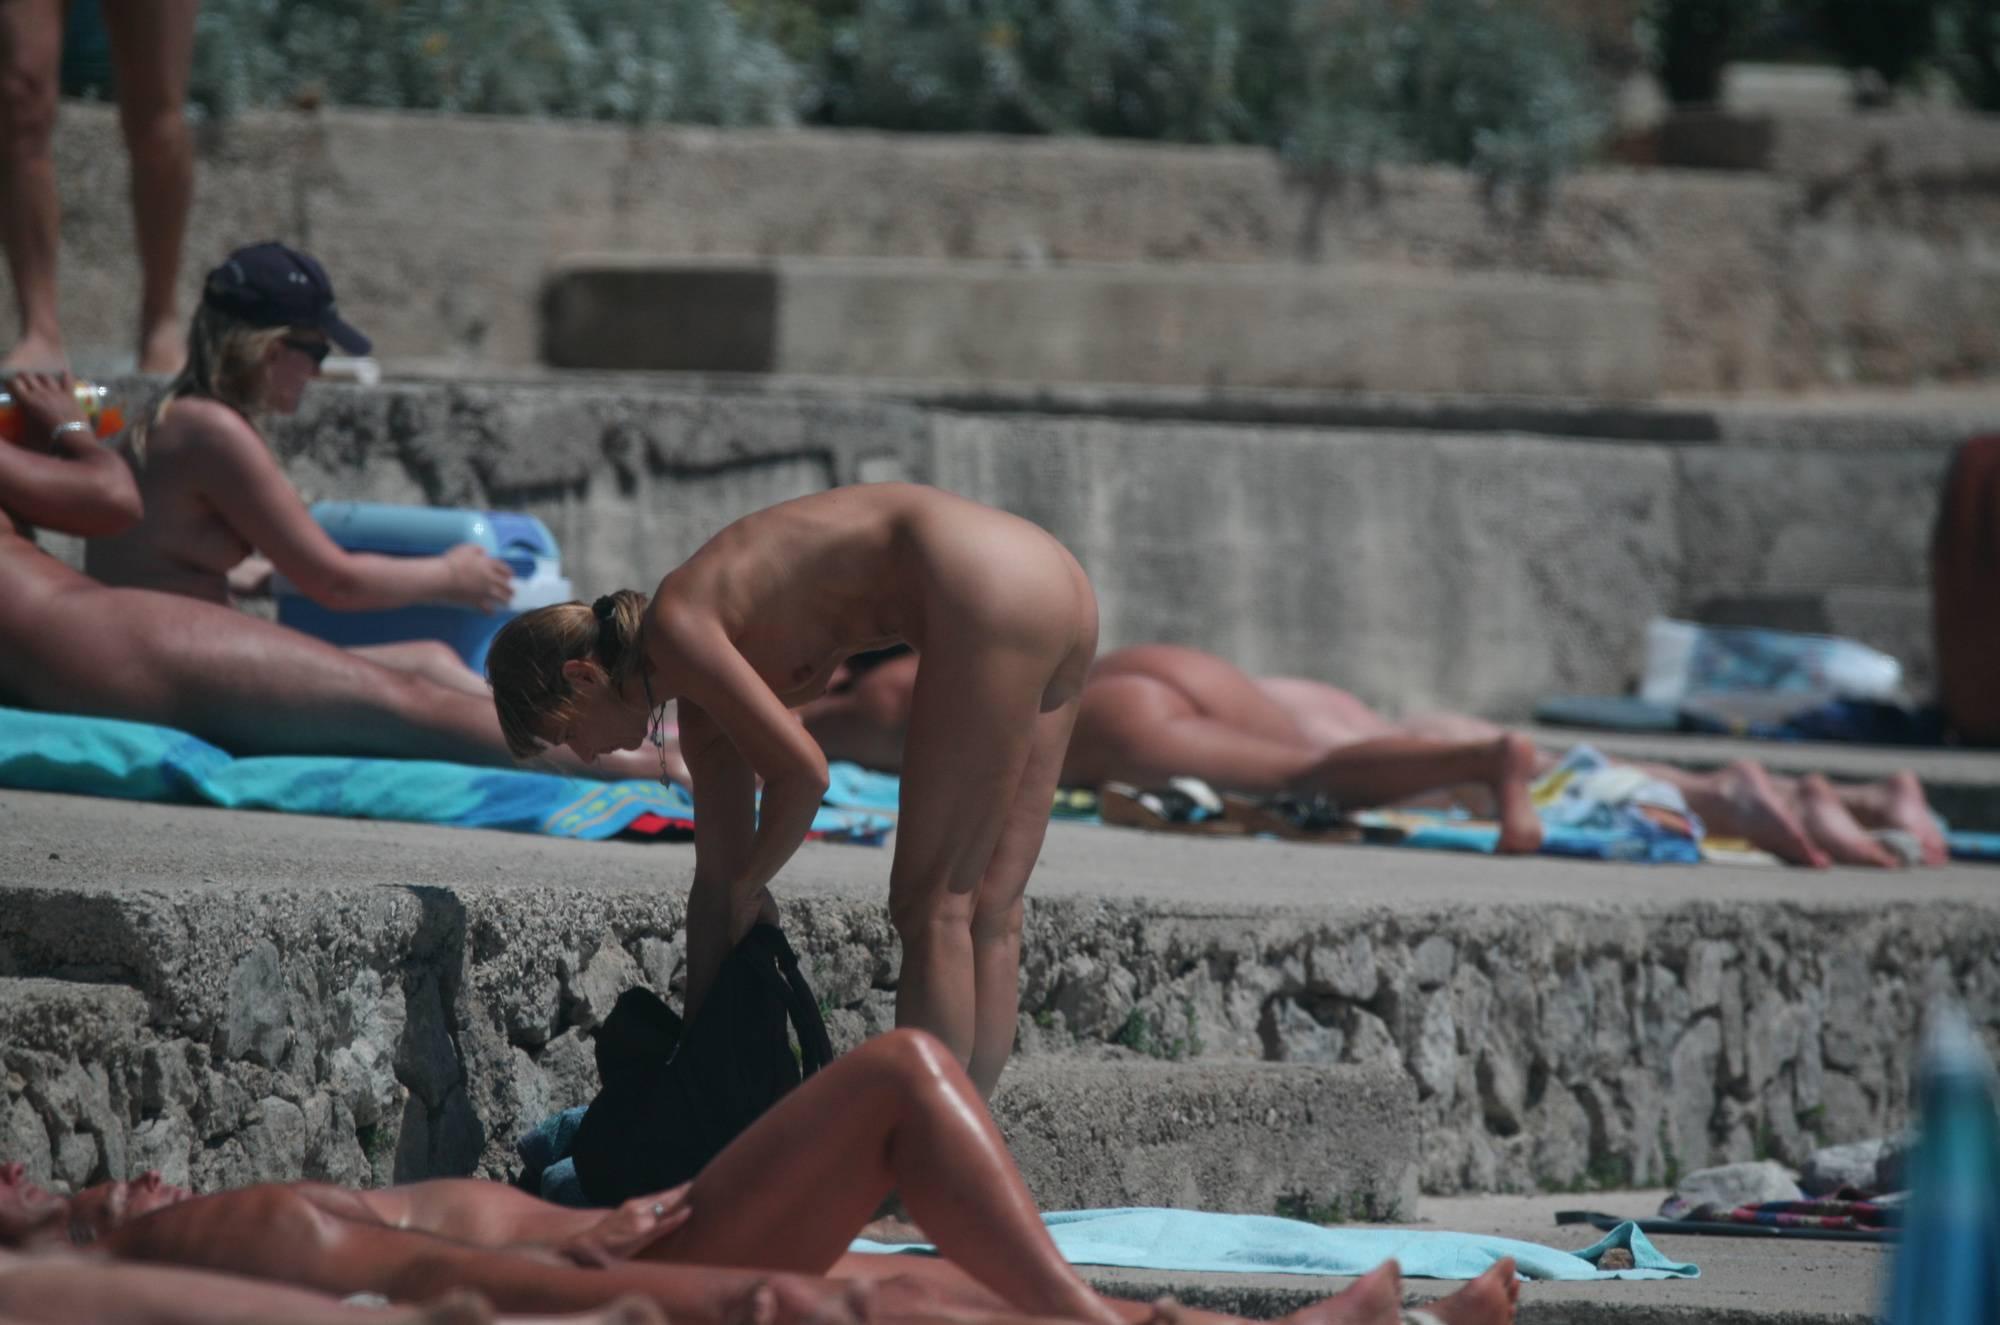 Nudist Photos Cove Pyramid Woman - 1